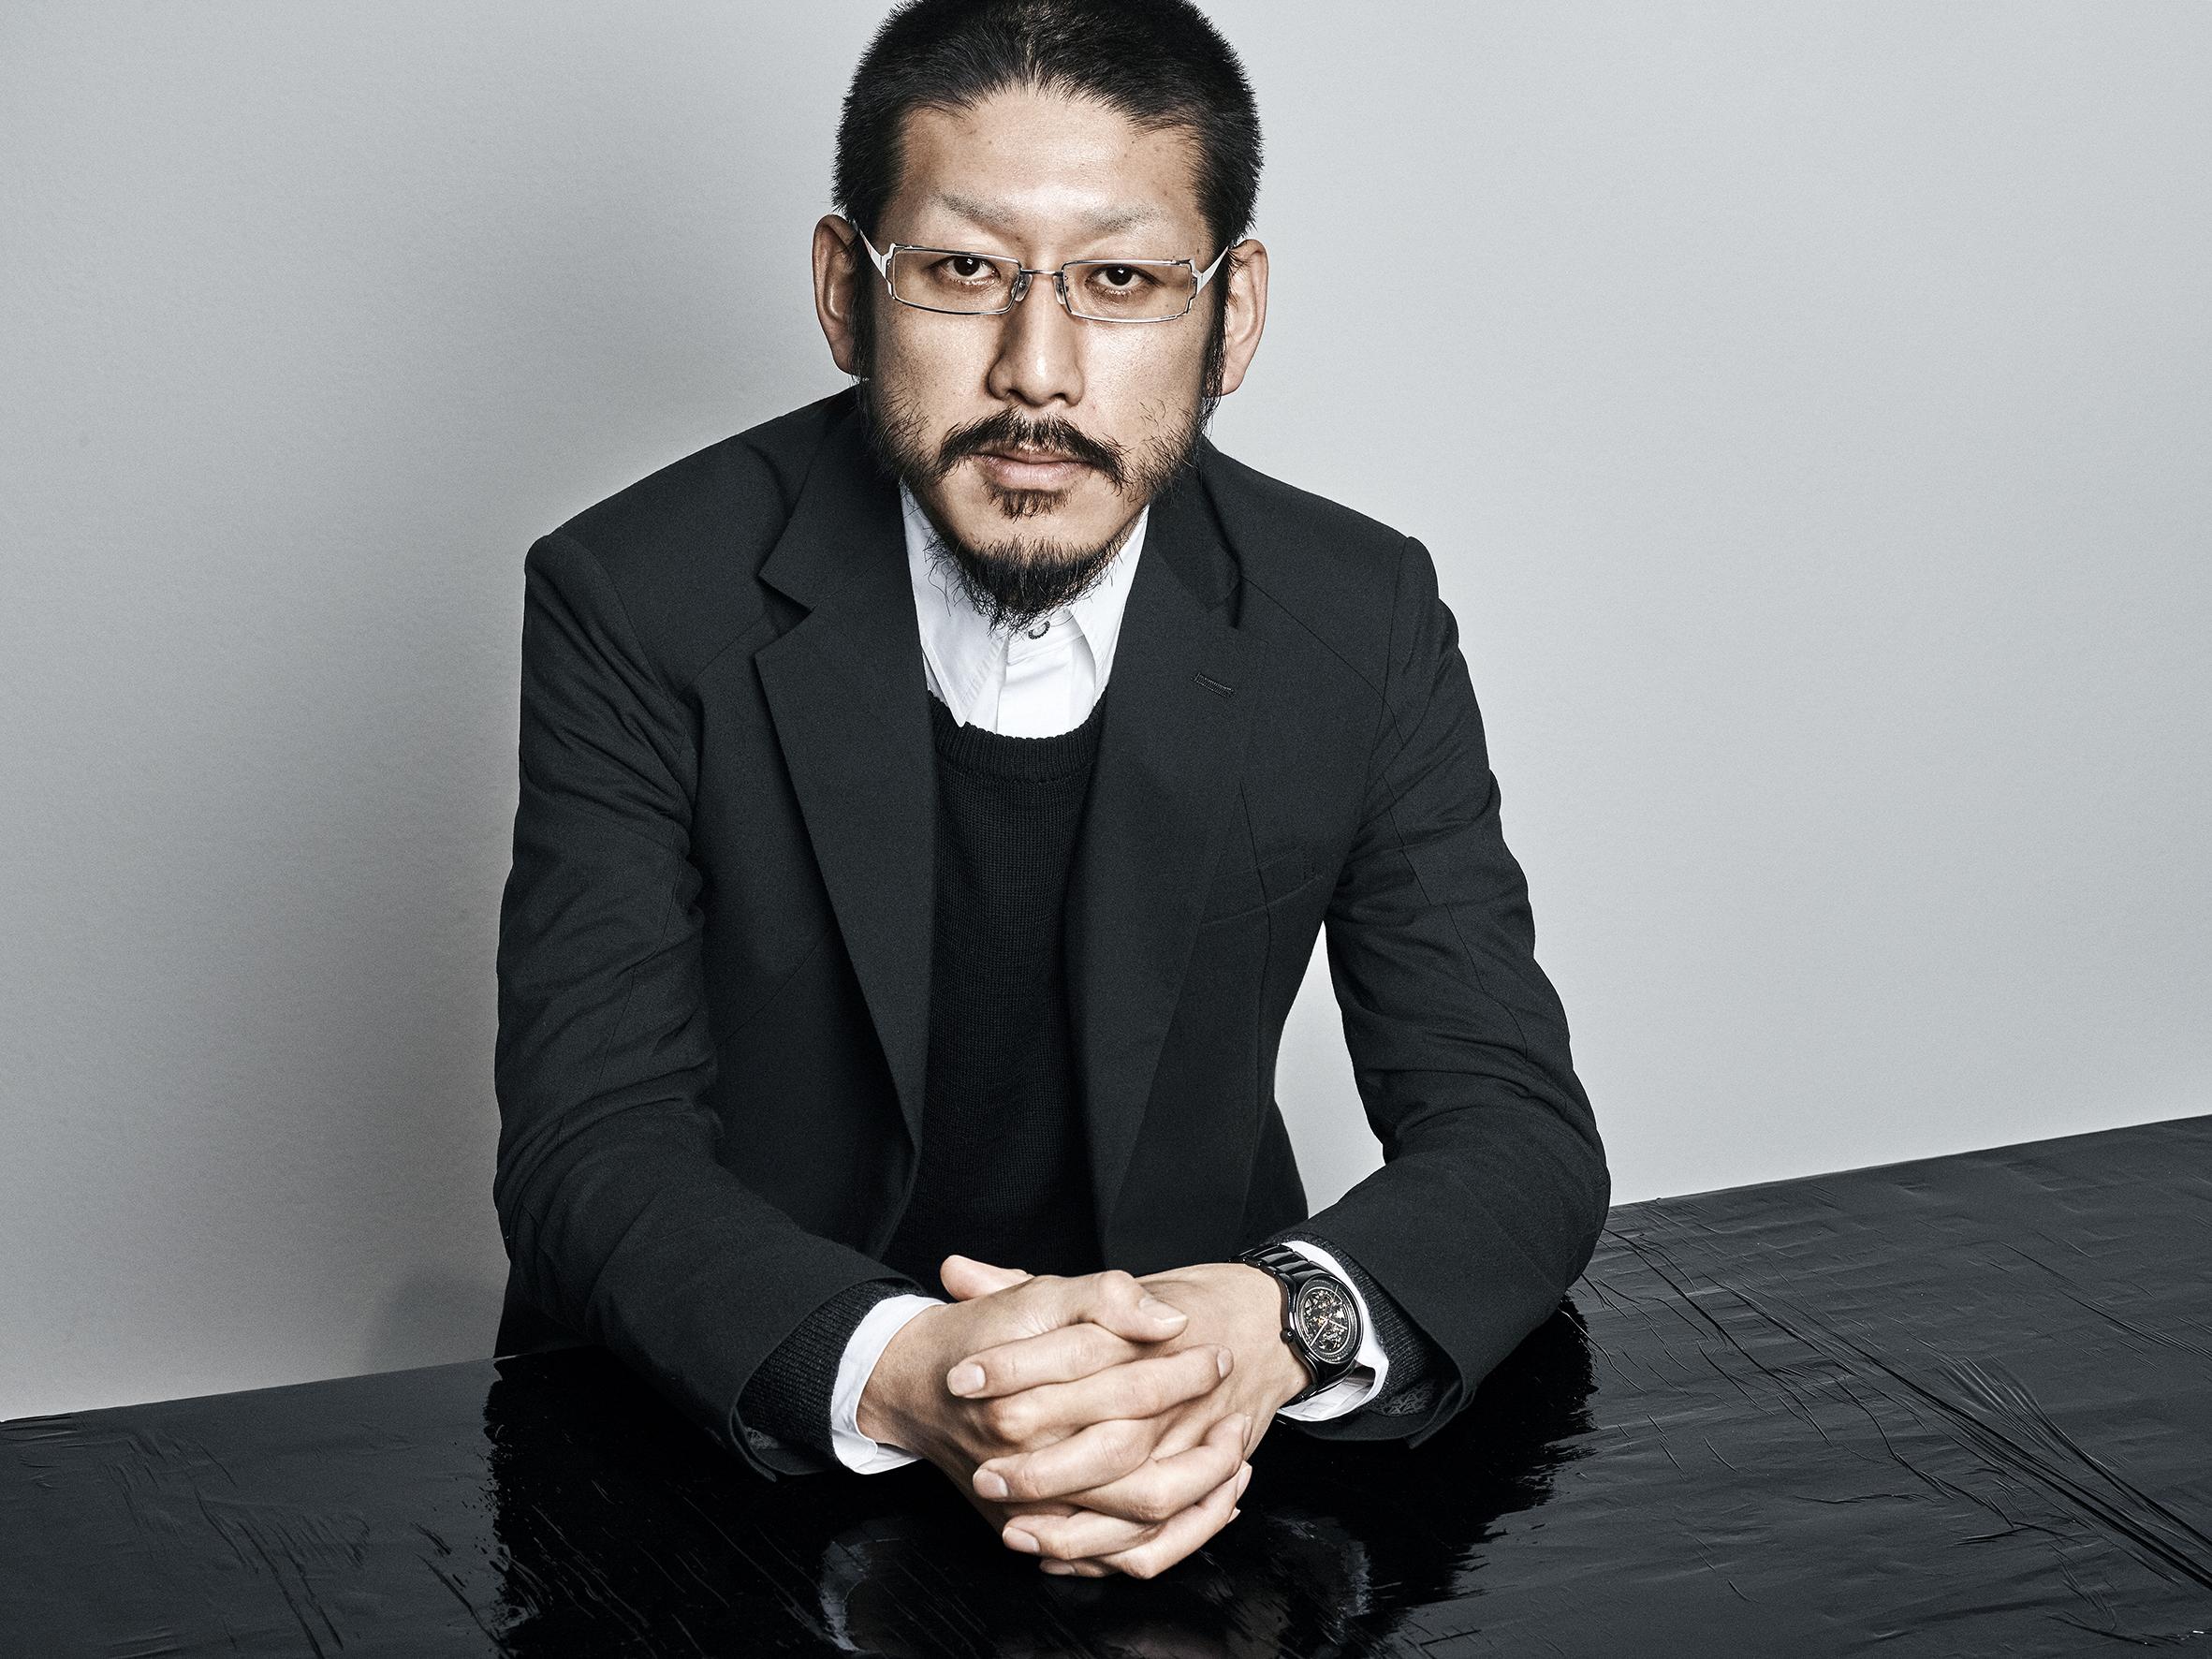 Japanese designer Kunihiko Morinaga